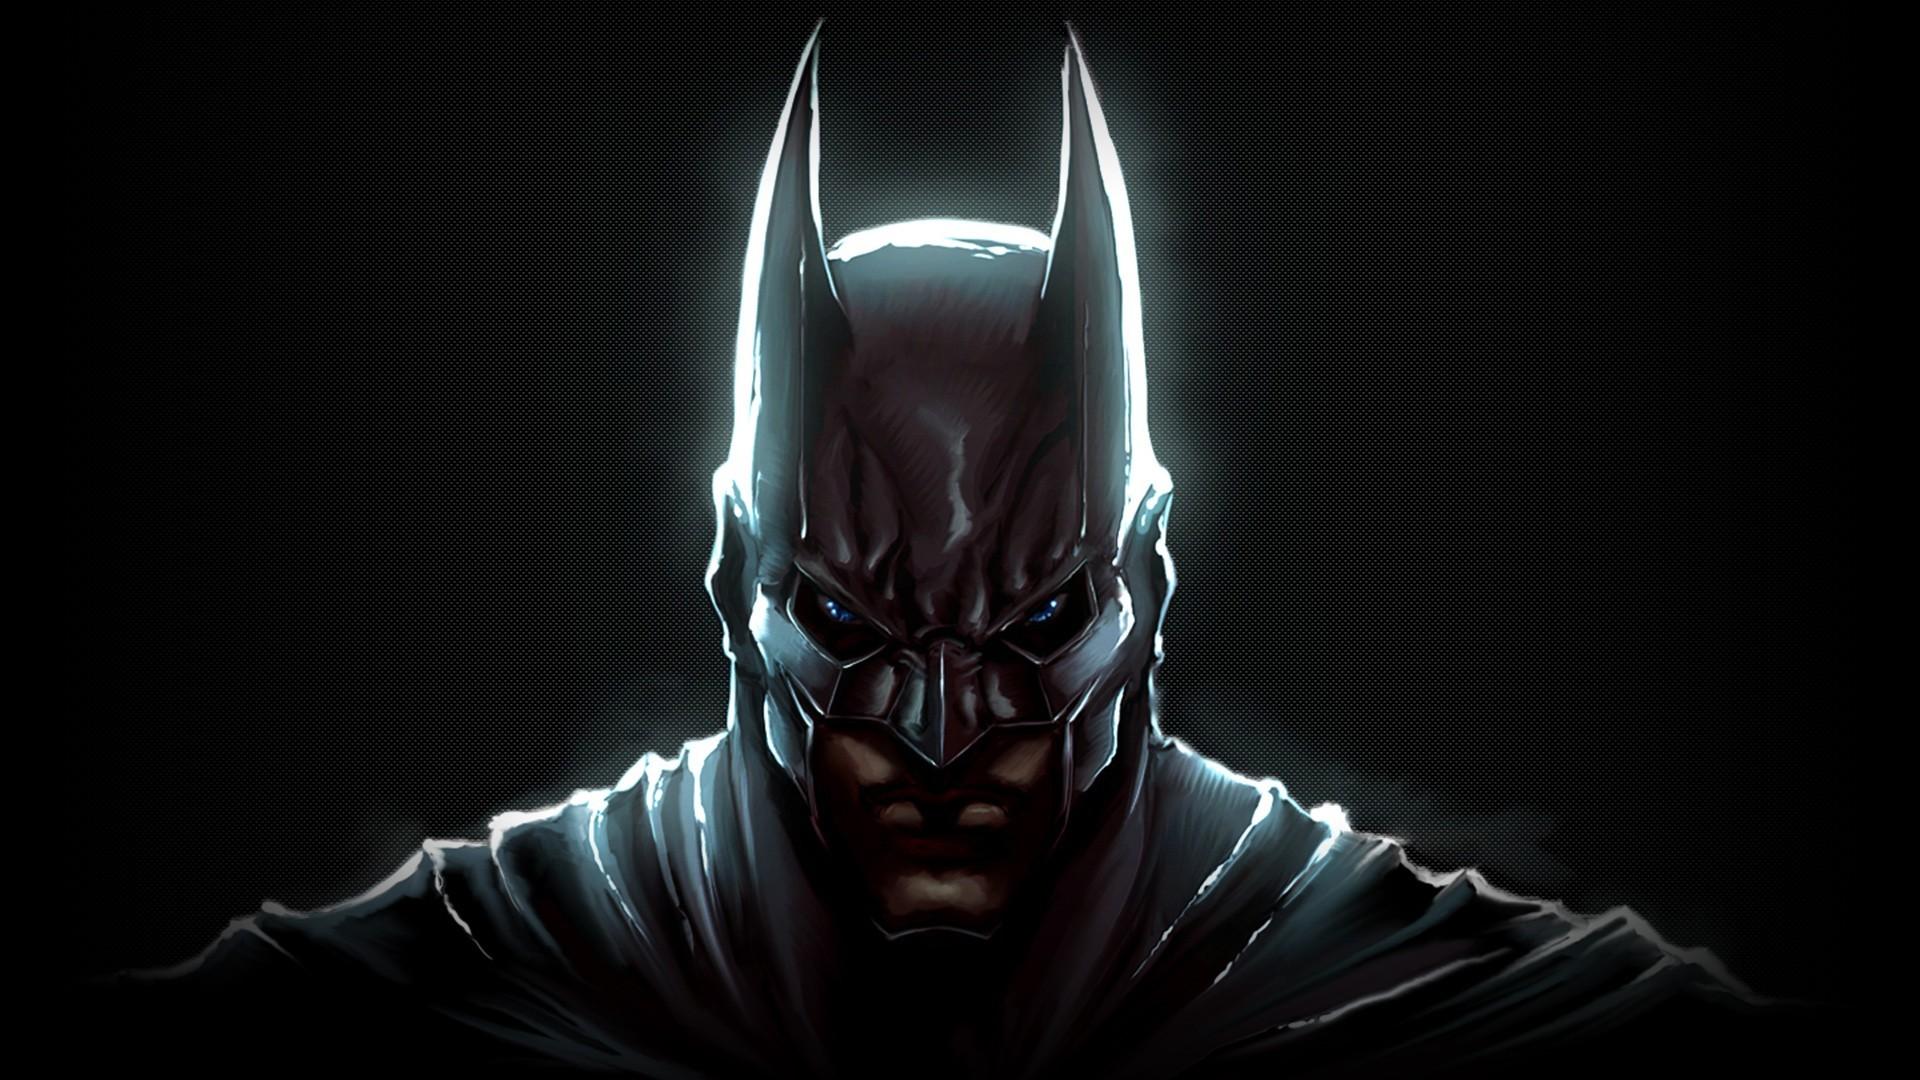 Res: 1920x1080, Dark Knight Batman Wallpaper